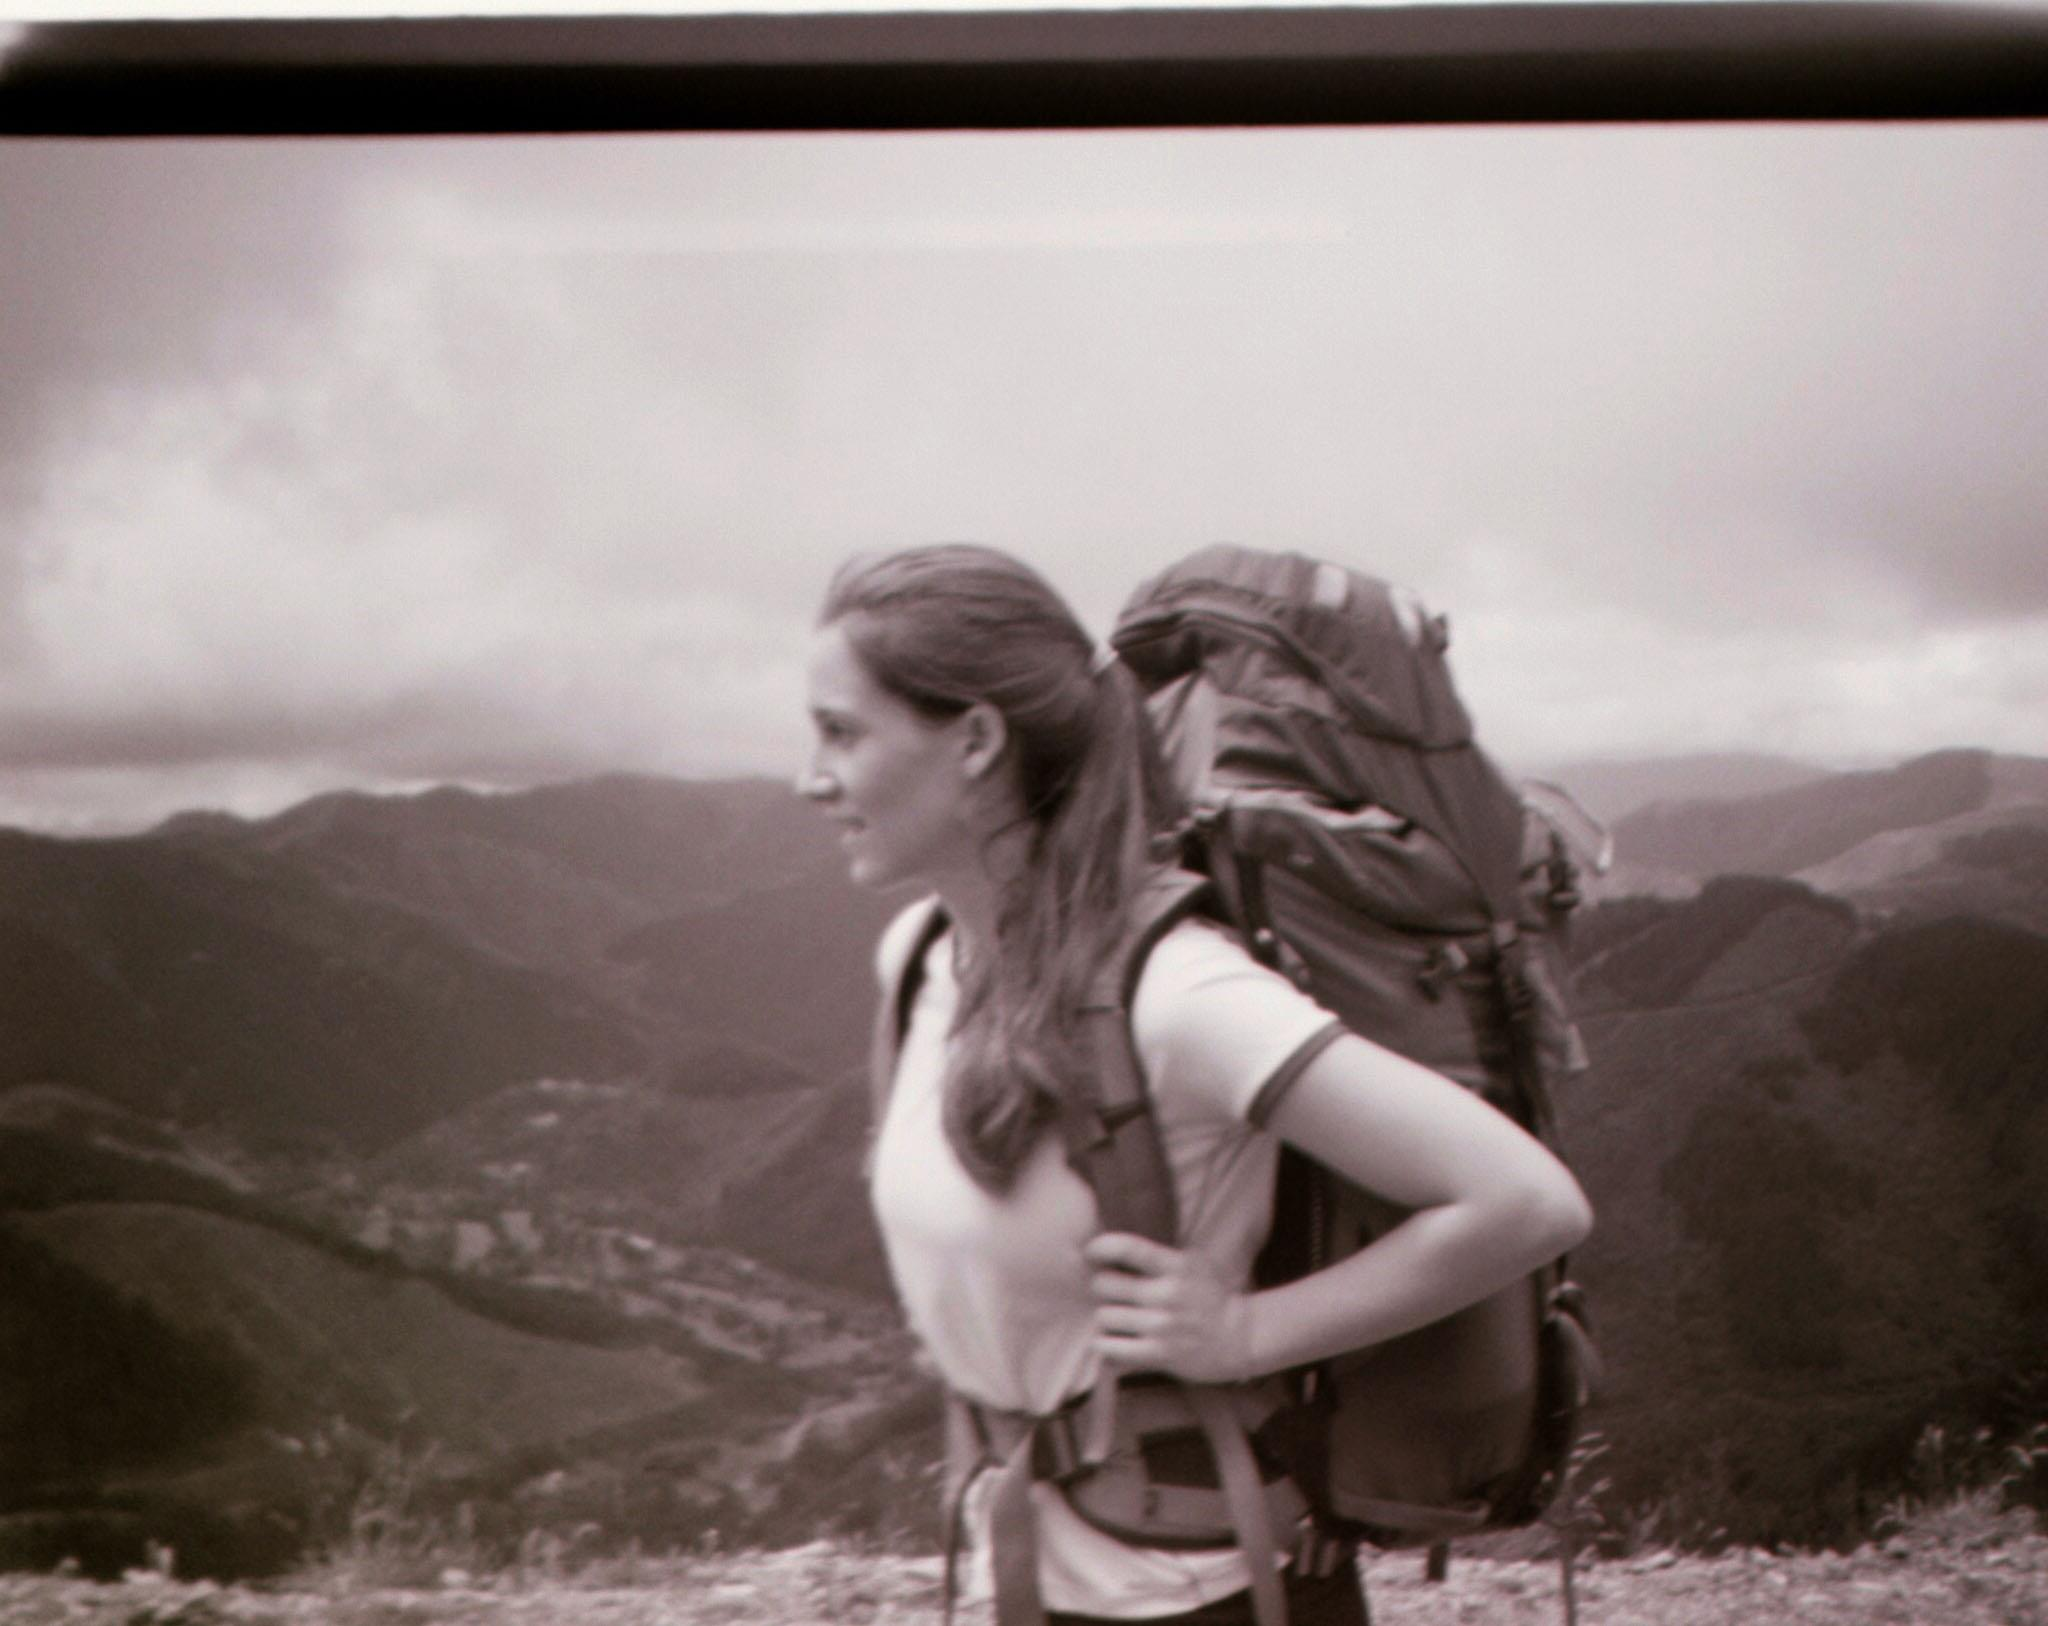 wandering_study_adventure_videographer_backpacking_new_zealand